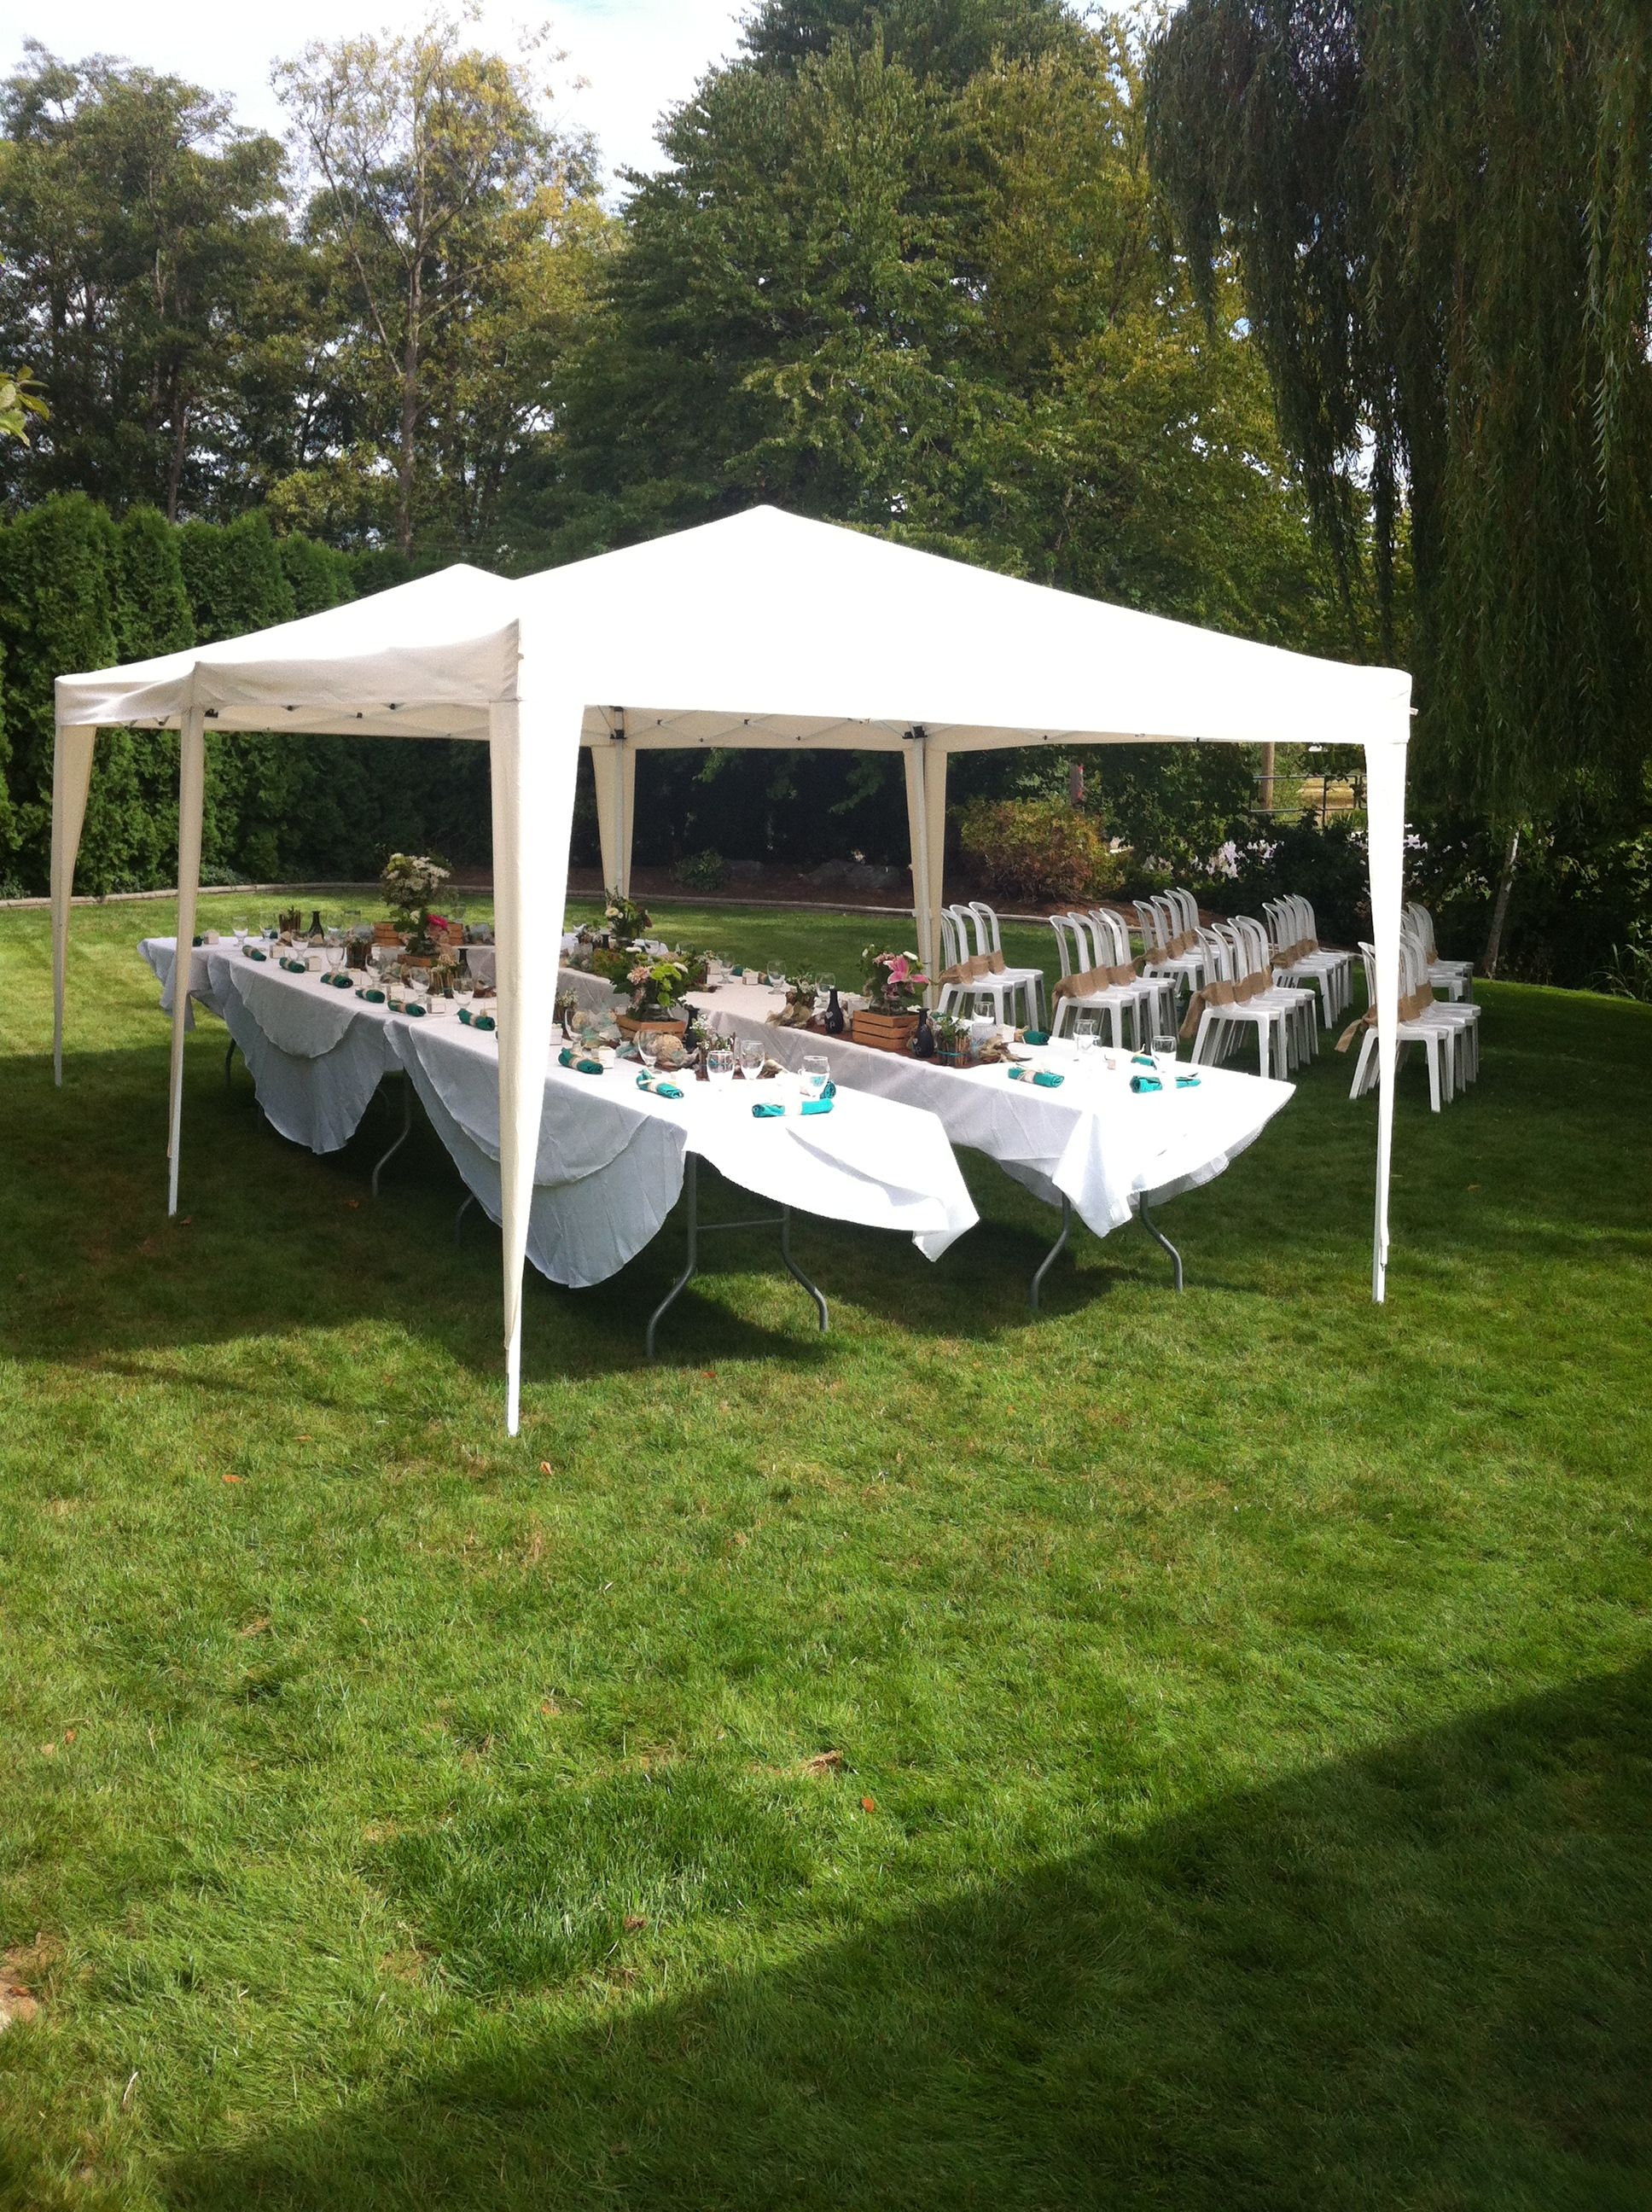 Backyard Bbq Wedding Ideas On A Budget tent set up for small backyard wedding Tent Set Up For Small Backyard Wedding